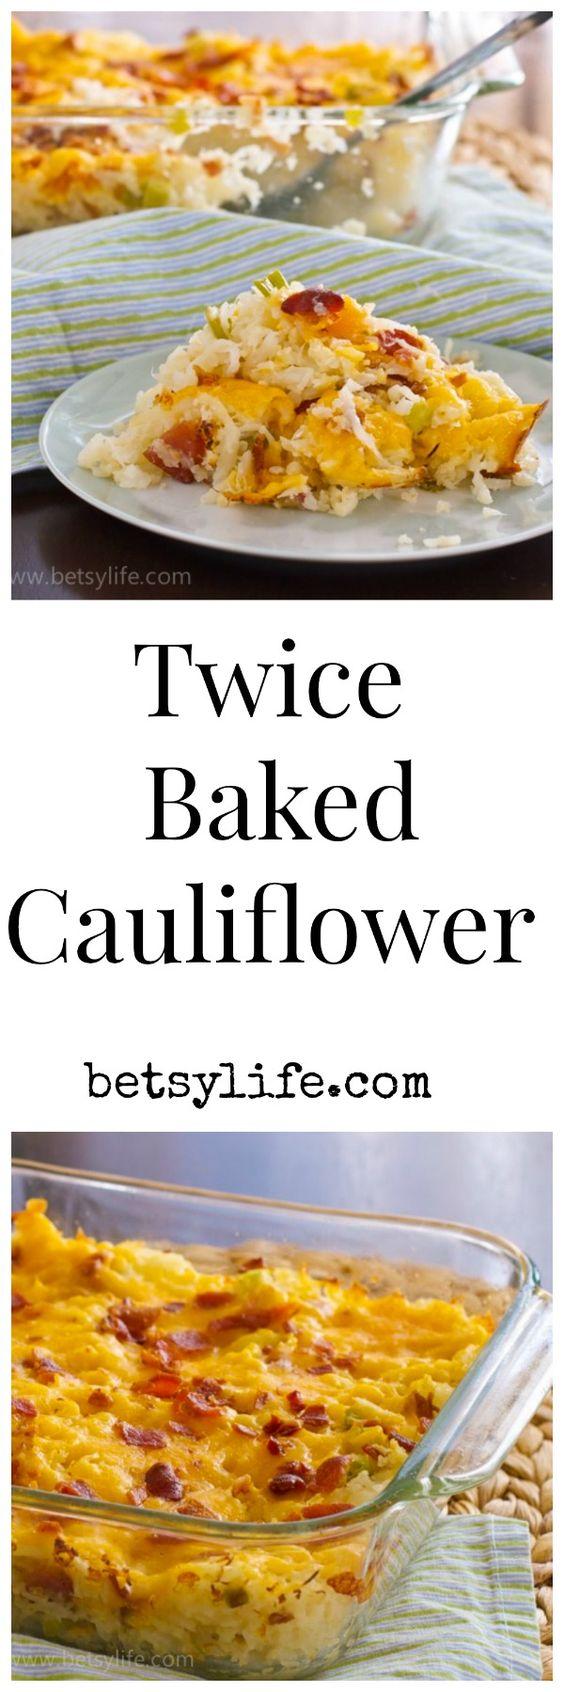 ... cauliflower recipes greek yogurt twice baked cauliflower baked